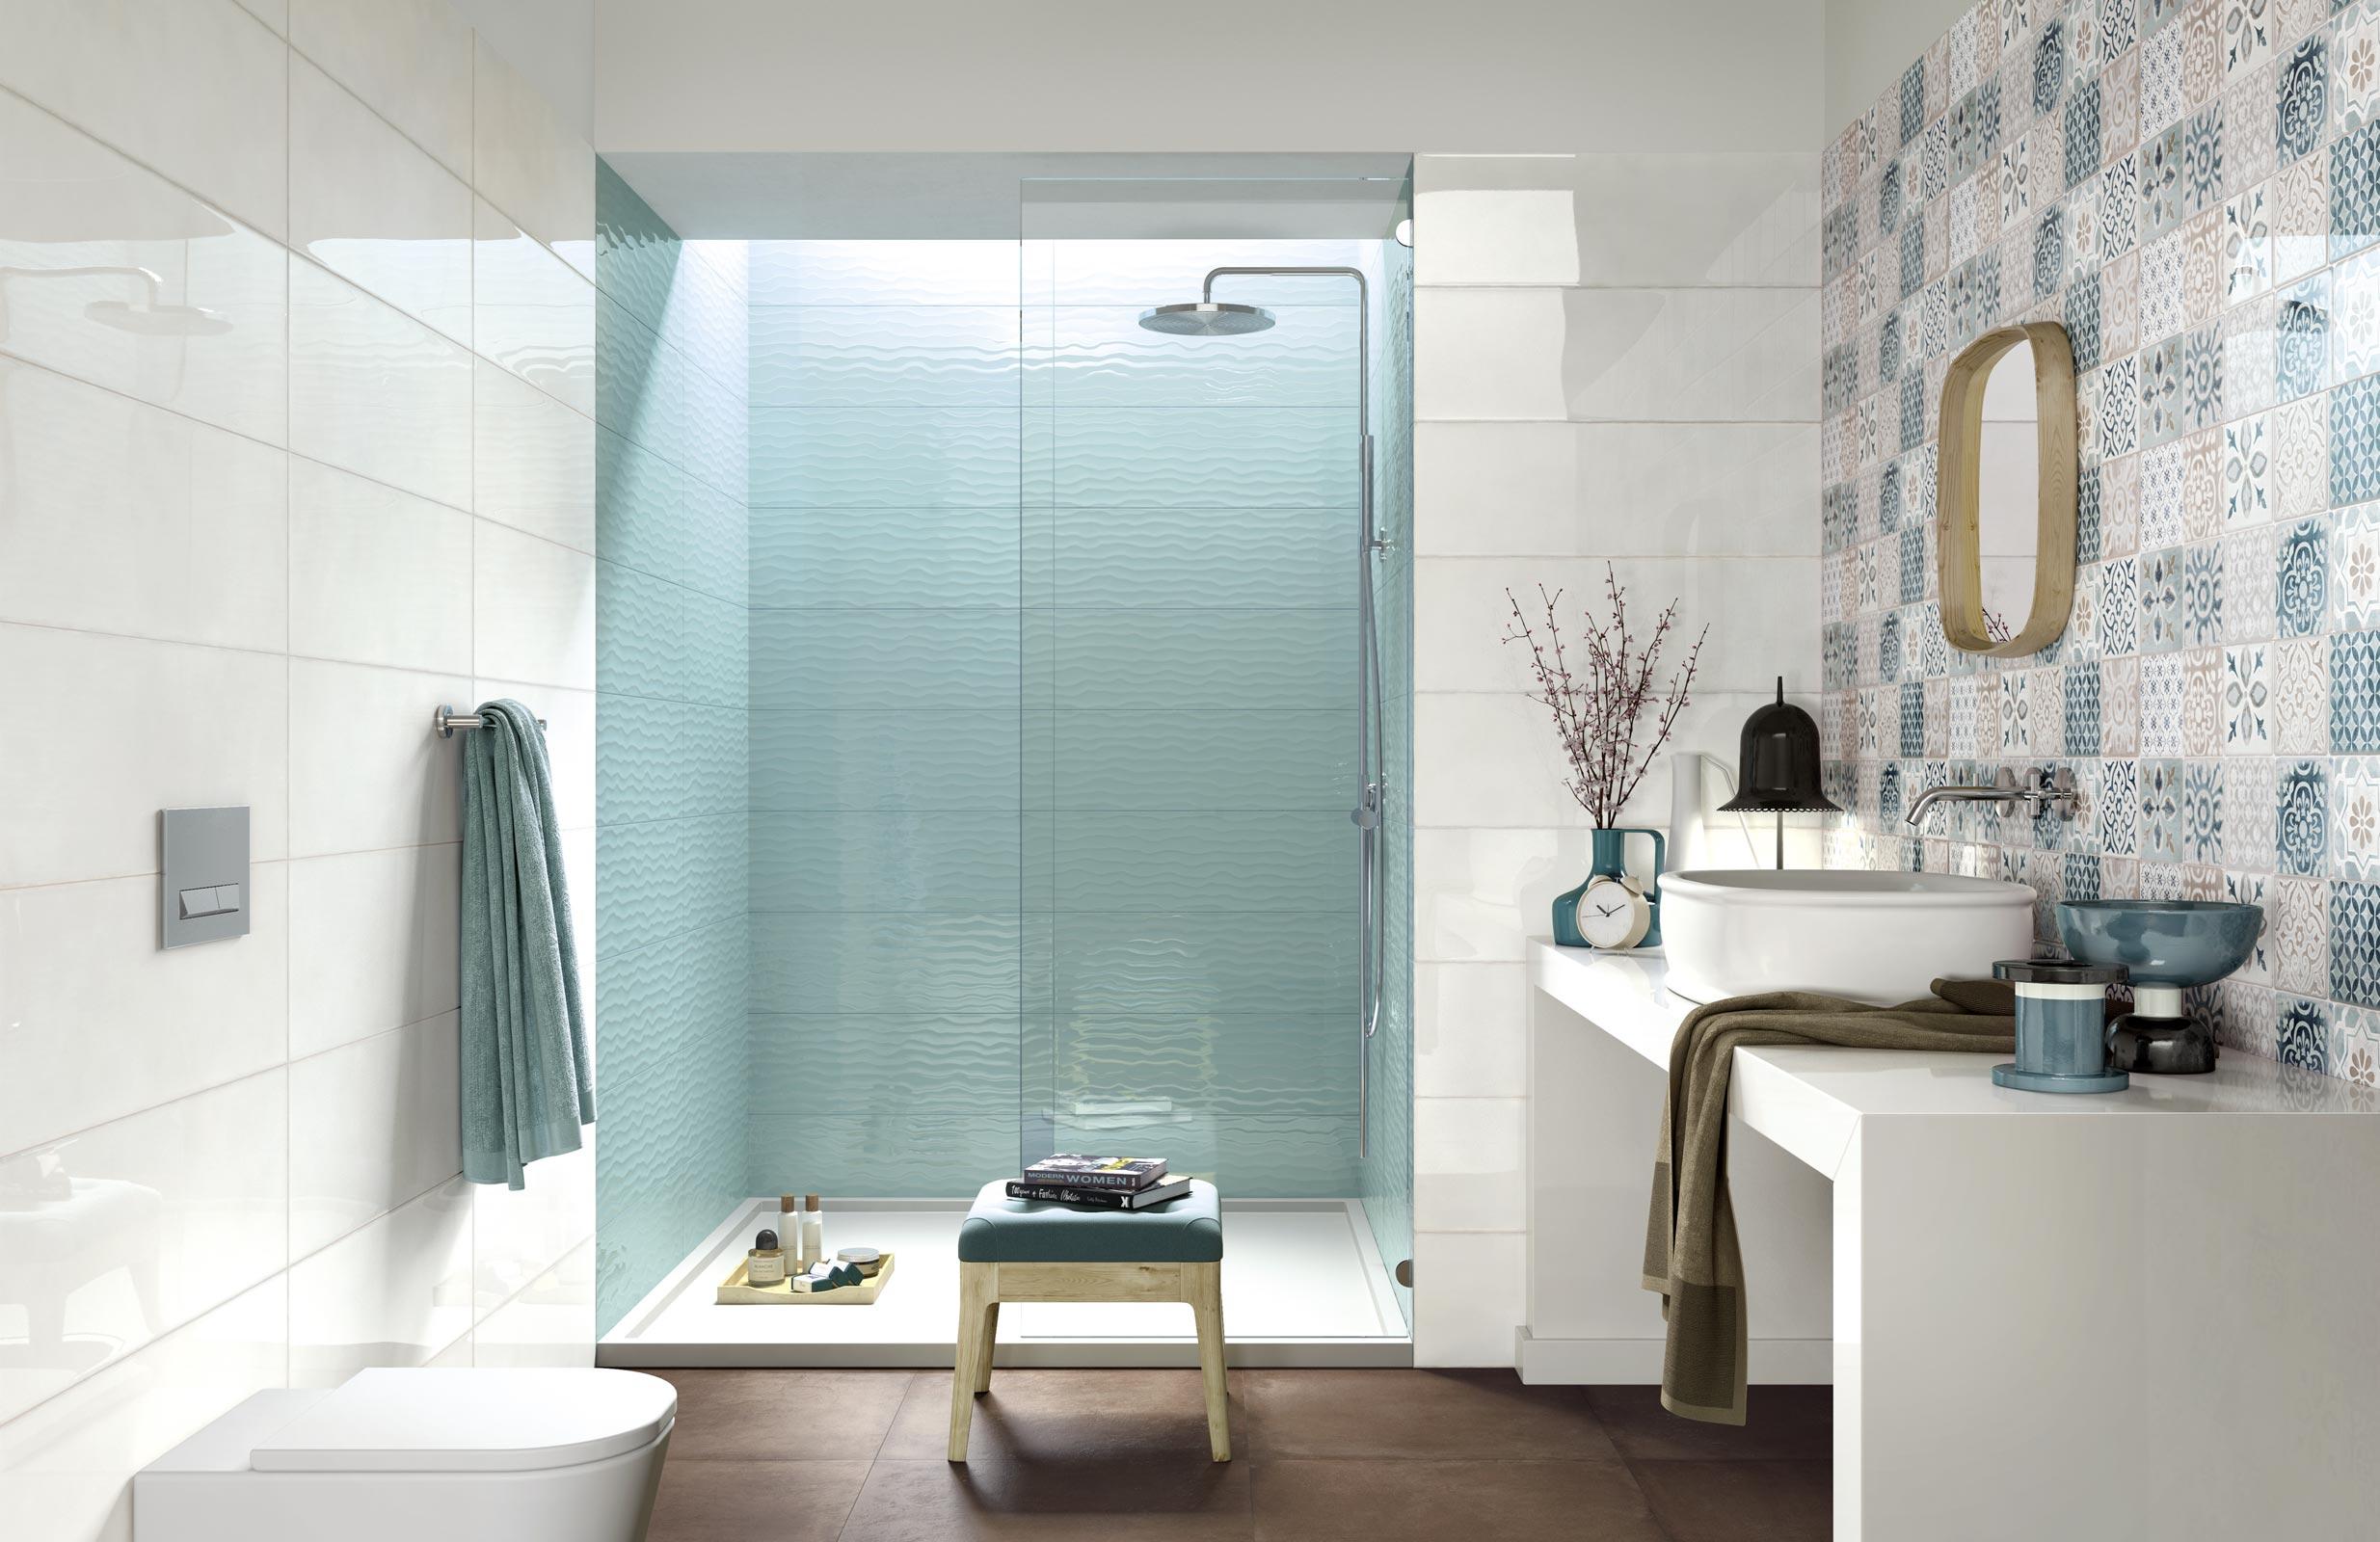 Azulejos Celeste para Cuarto de Baño | Ragno